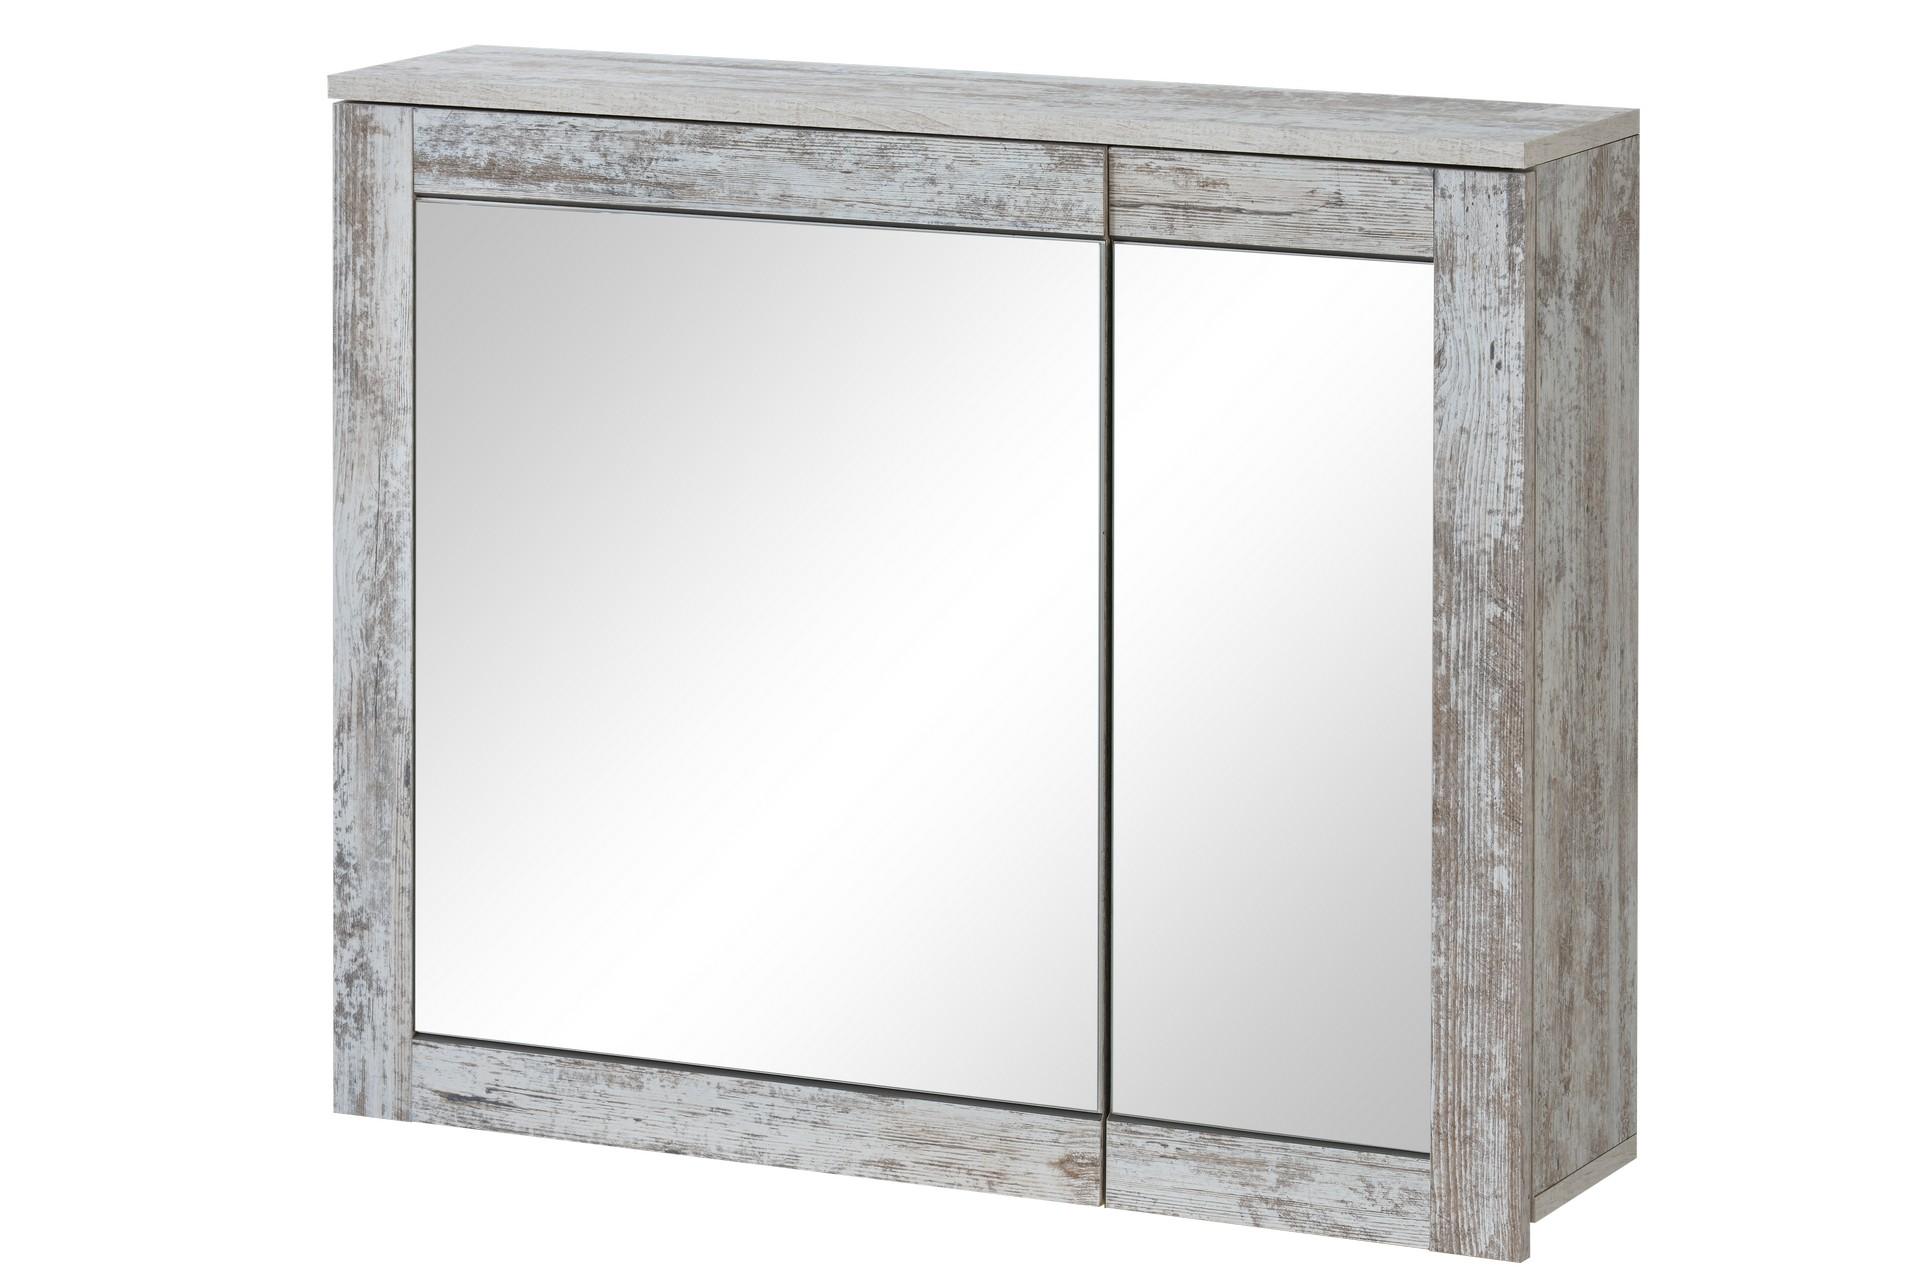 Dulap baie suspendat cu 2 usi si oglinda Provensia 2 l82xA20xH70 cm